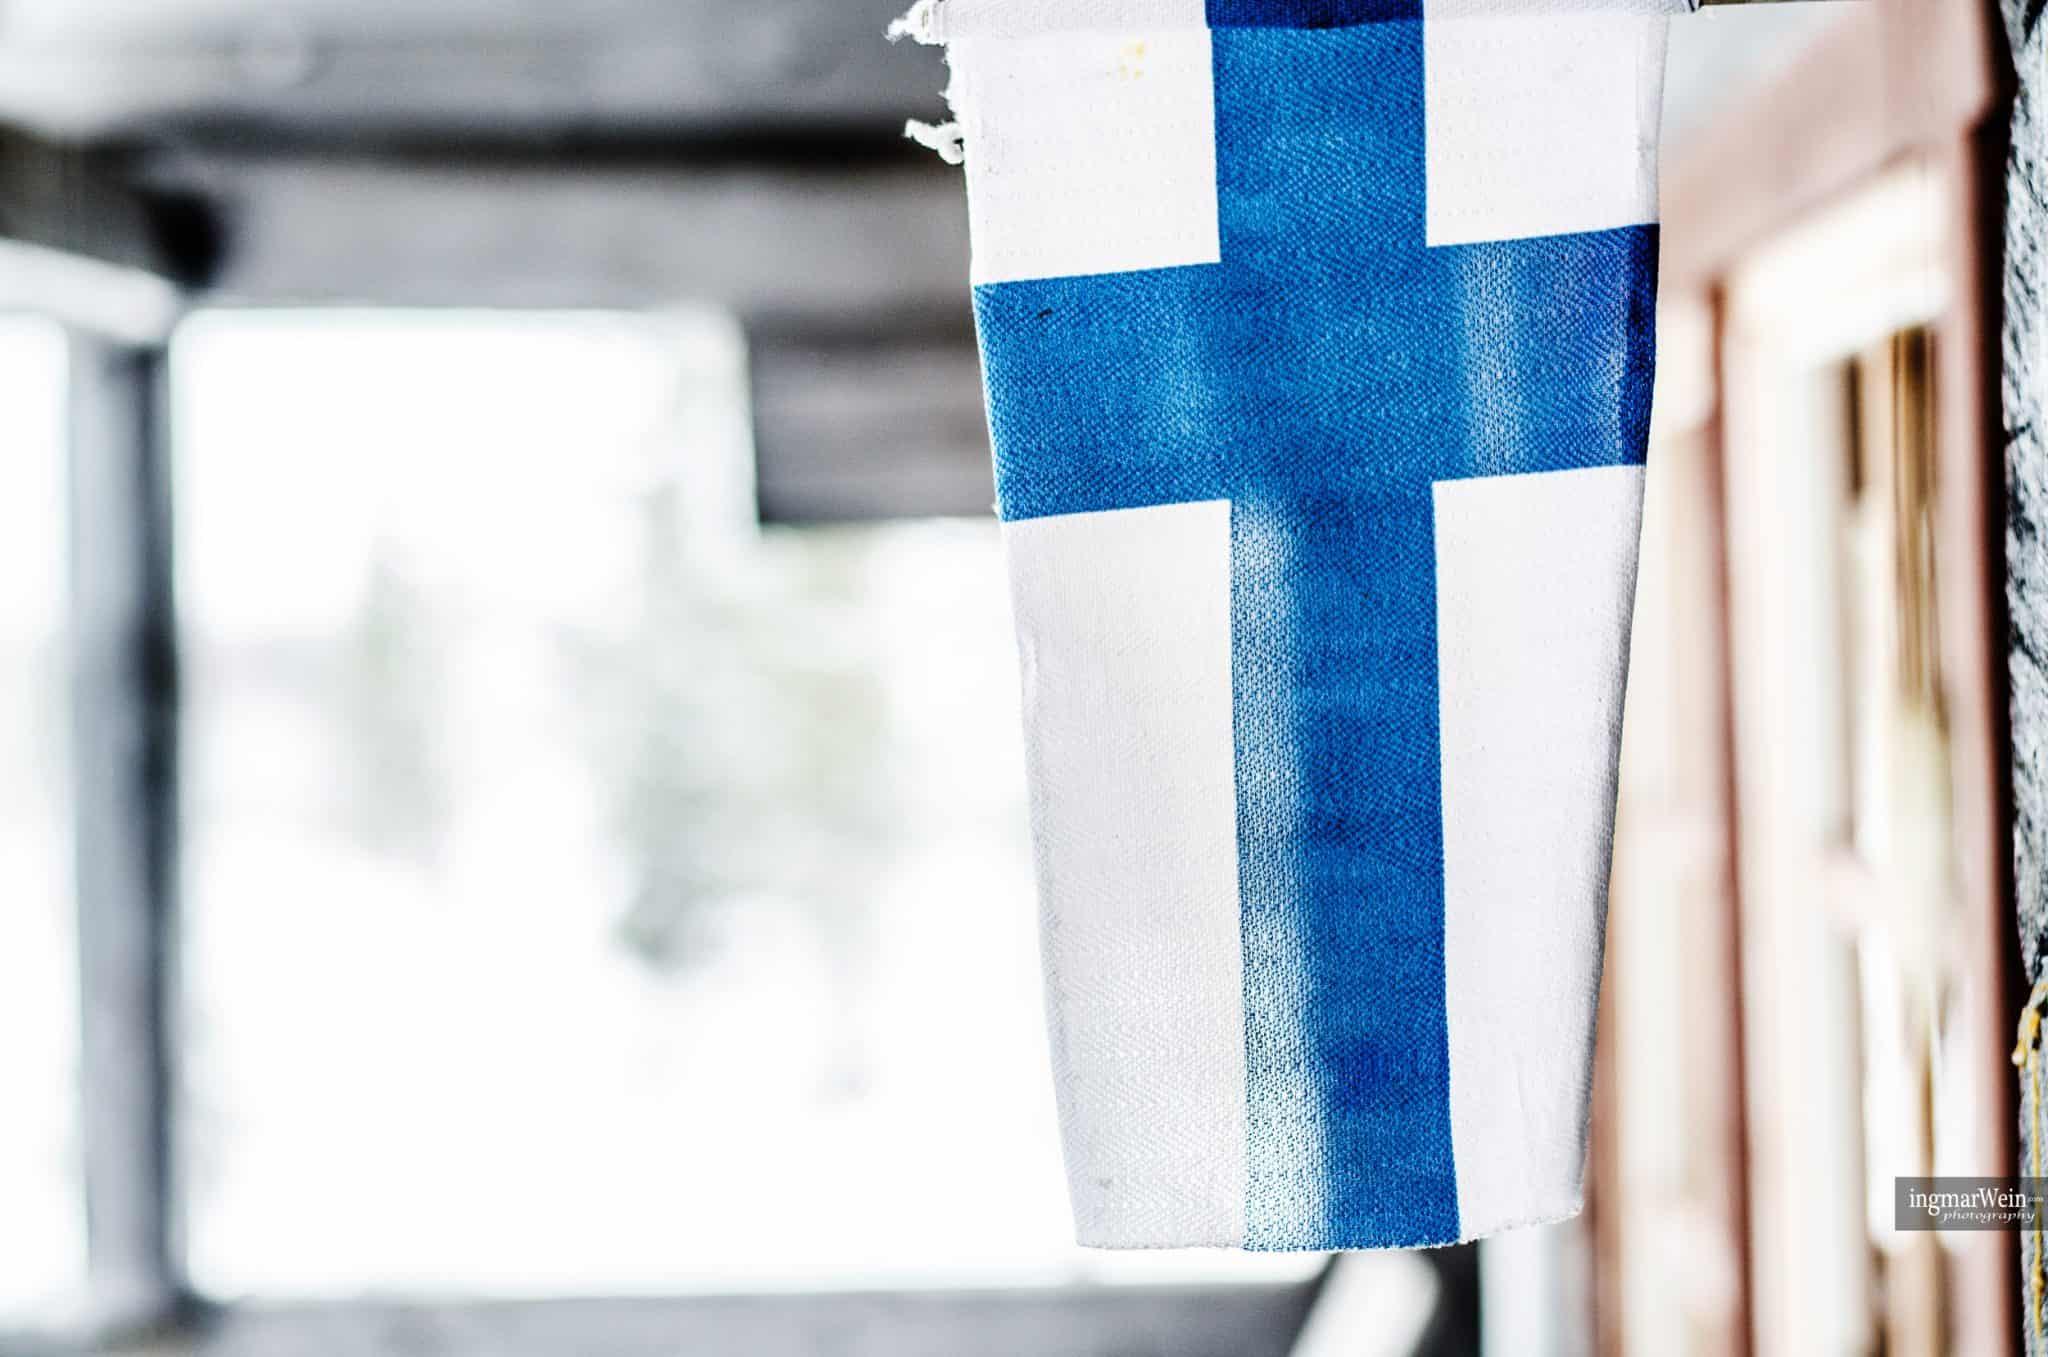 Finland 2014/2015